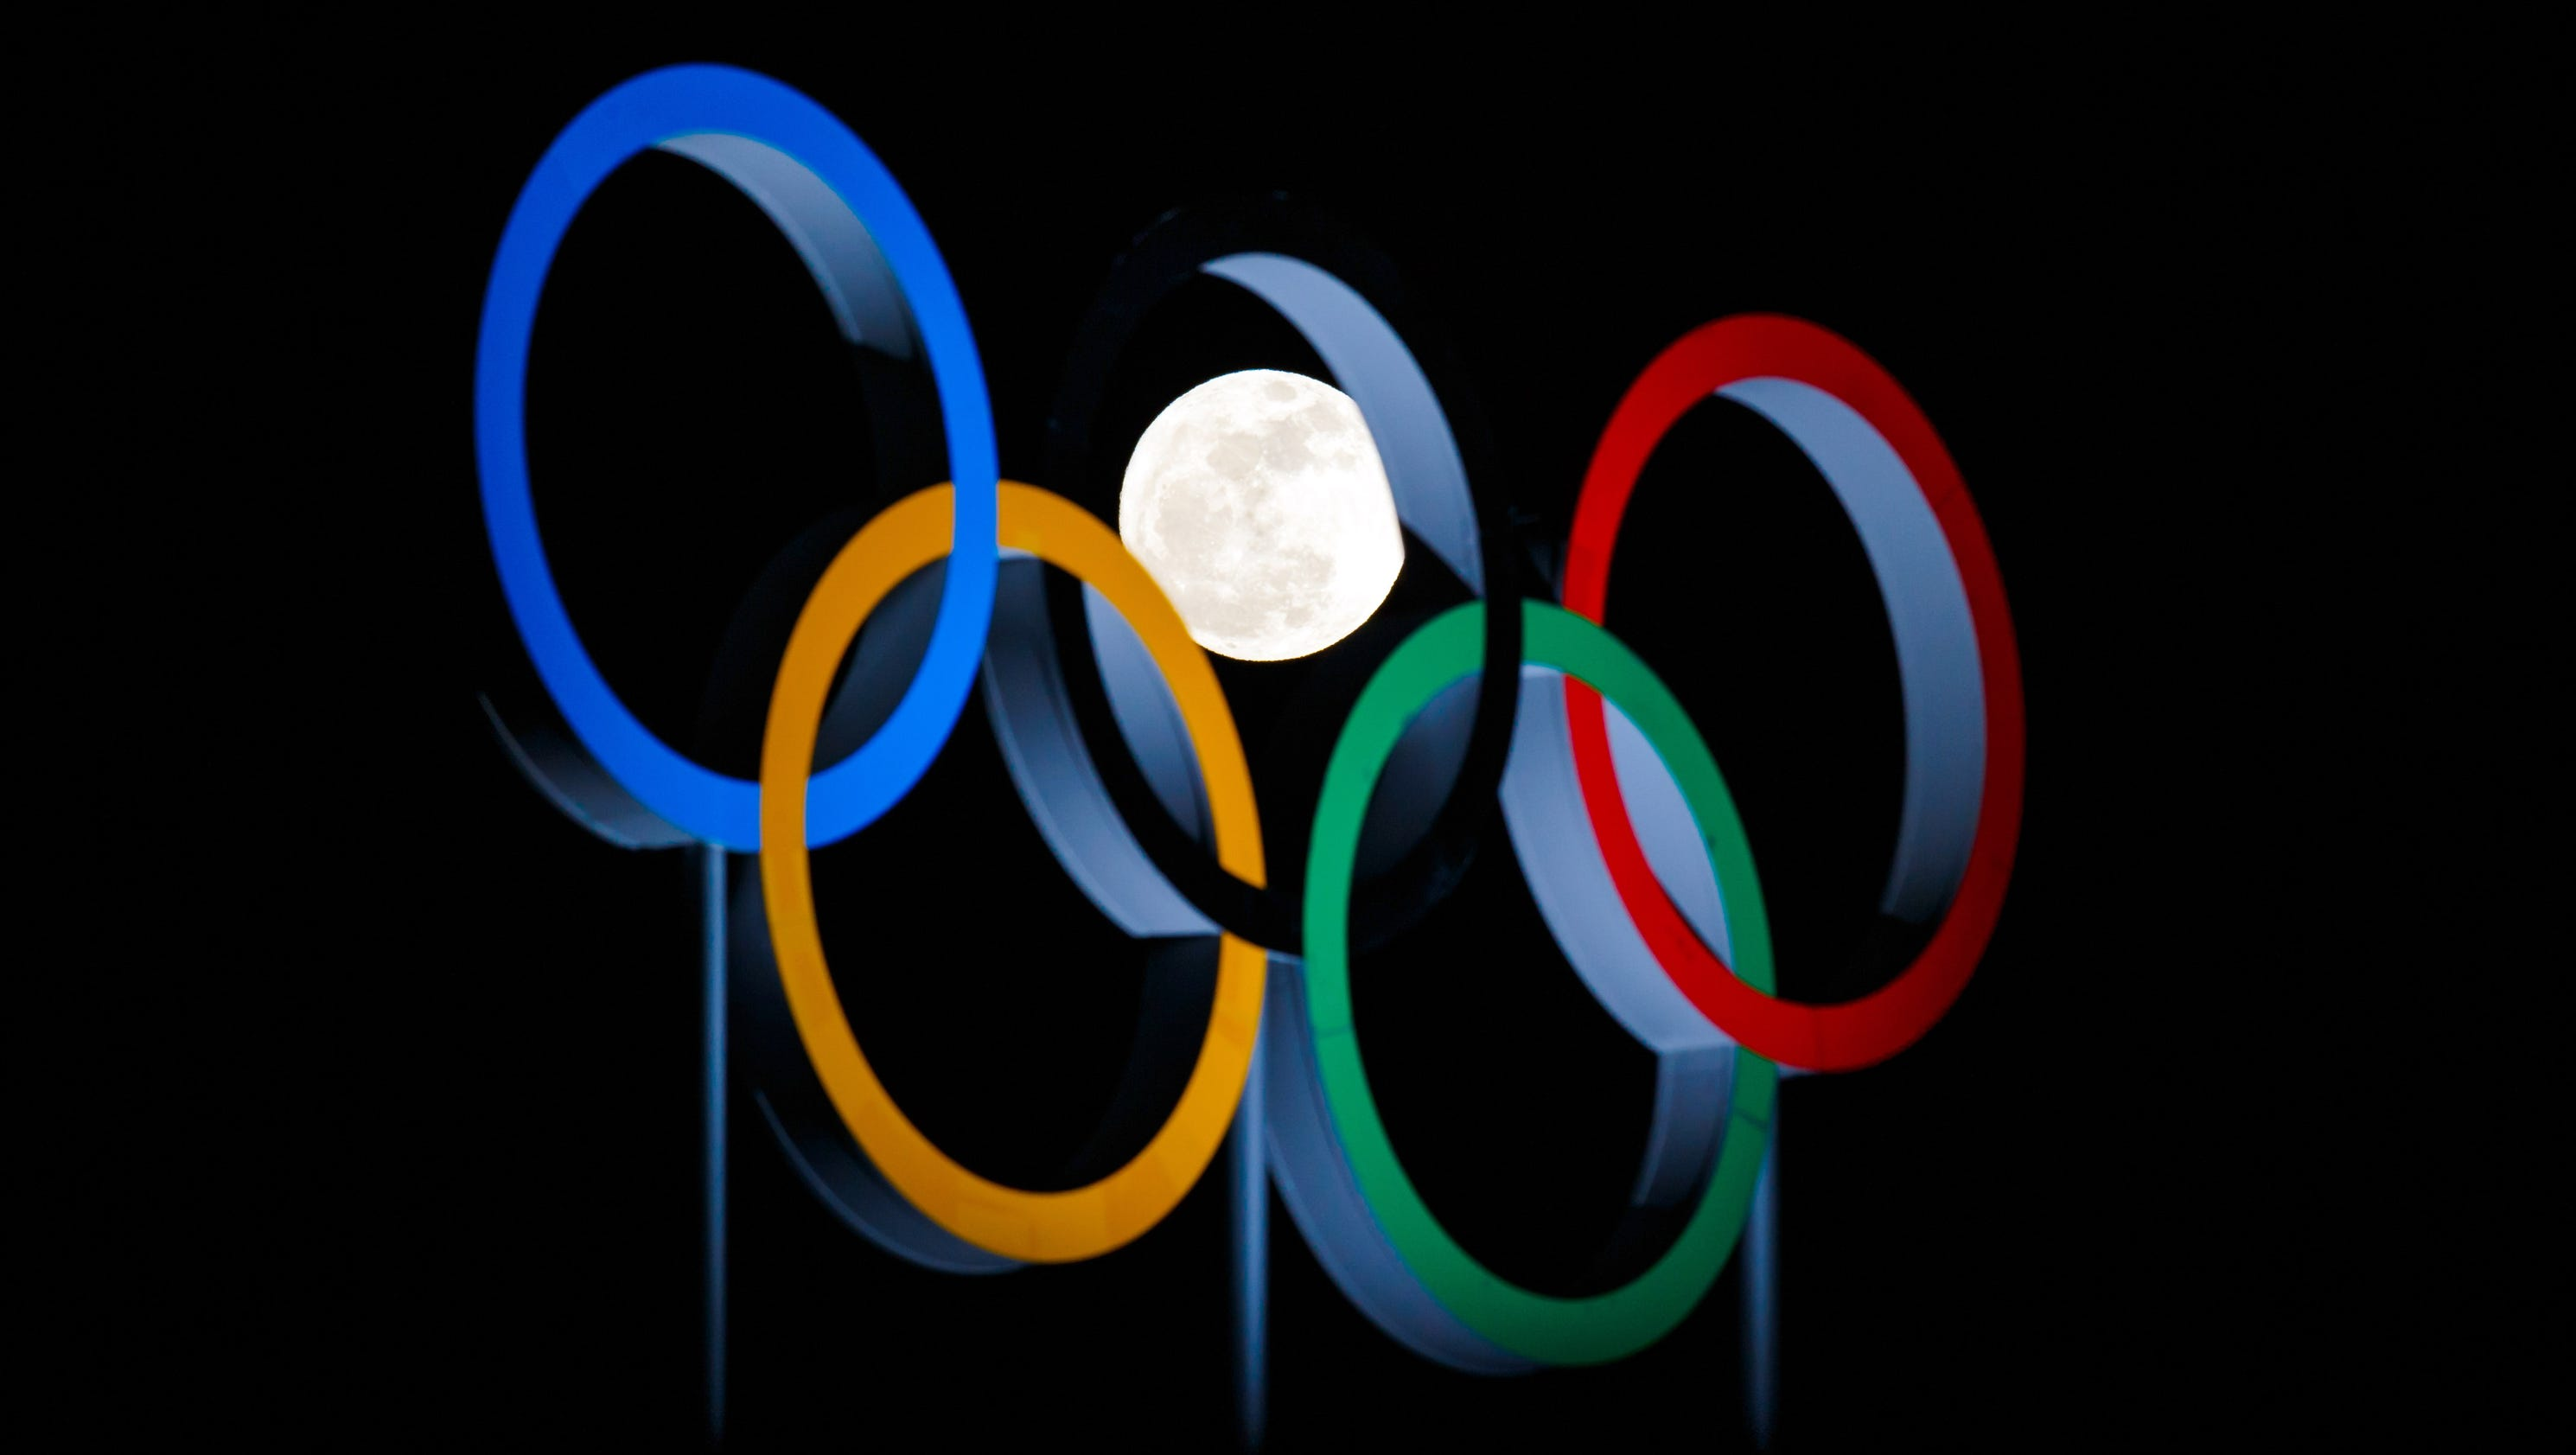 Nbc universal pays 775 billion for olympics through 2032 buycottarizona Image collections